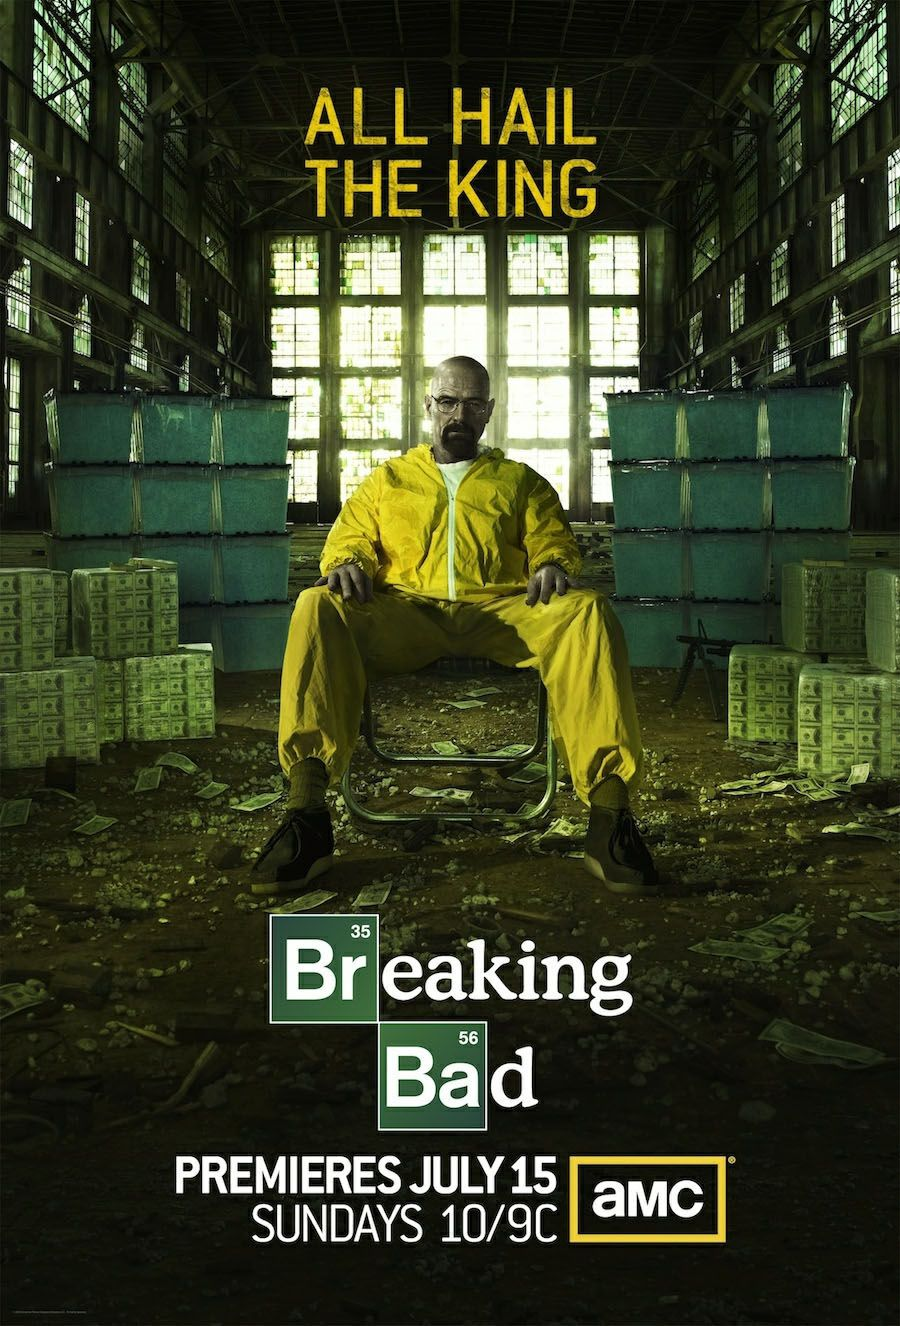 Breaking Bad Season 5 2012 2013 Breaking Bad Season 5 Breaking Bad Seasons Breaking Bad Poster